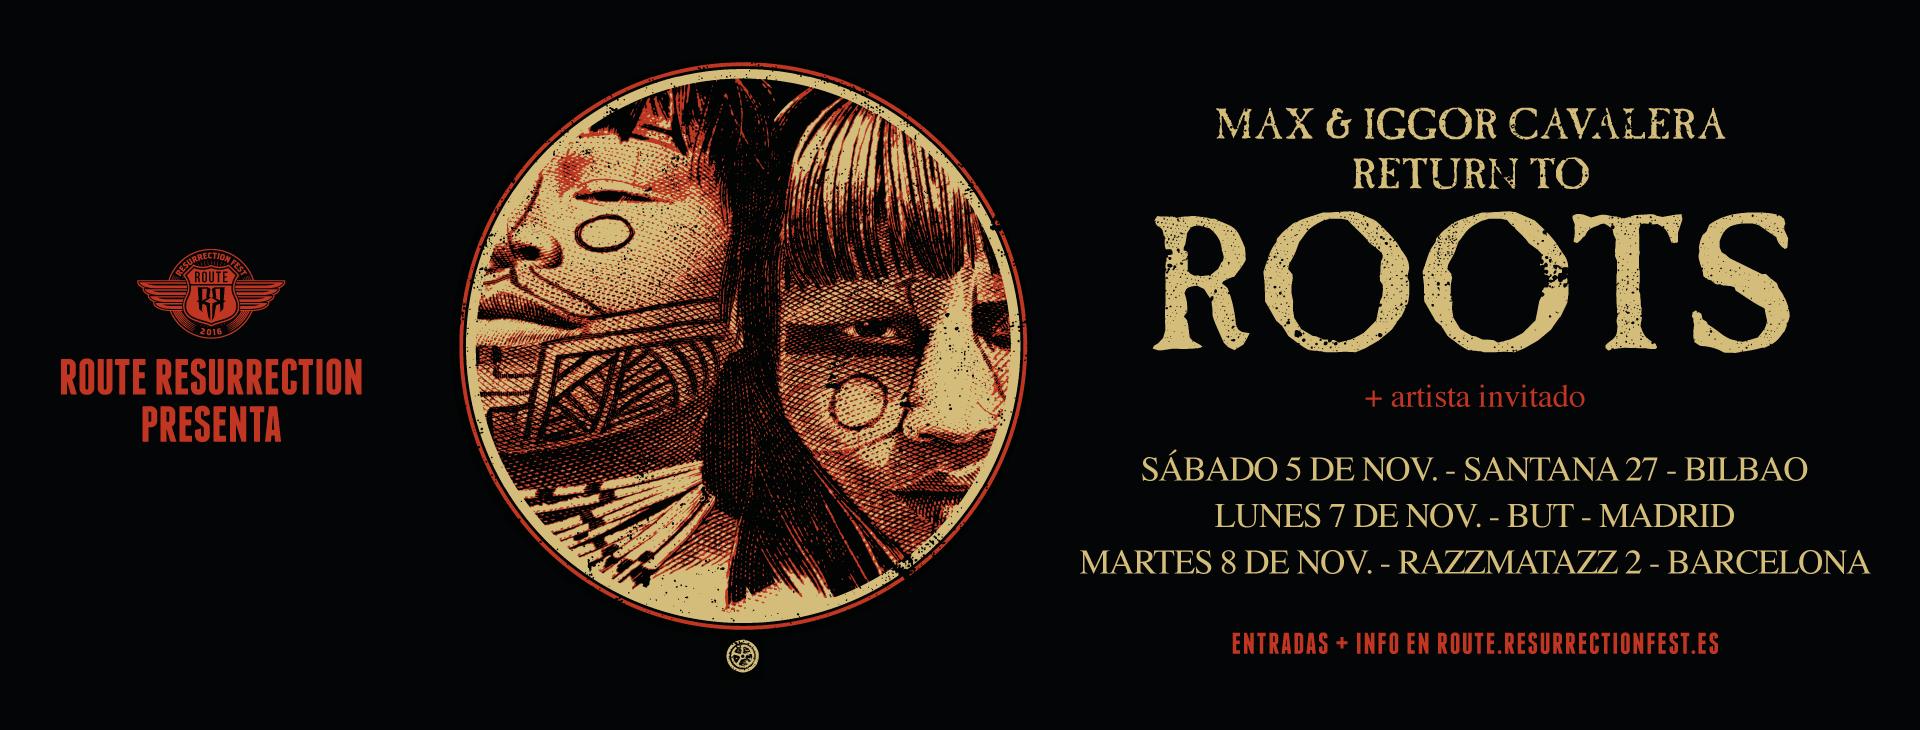 Route Resurrection Fest 2016 - Max and Iggor Cavalera - Event